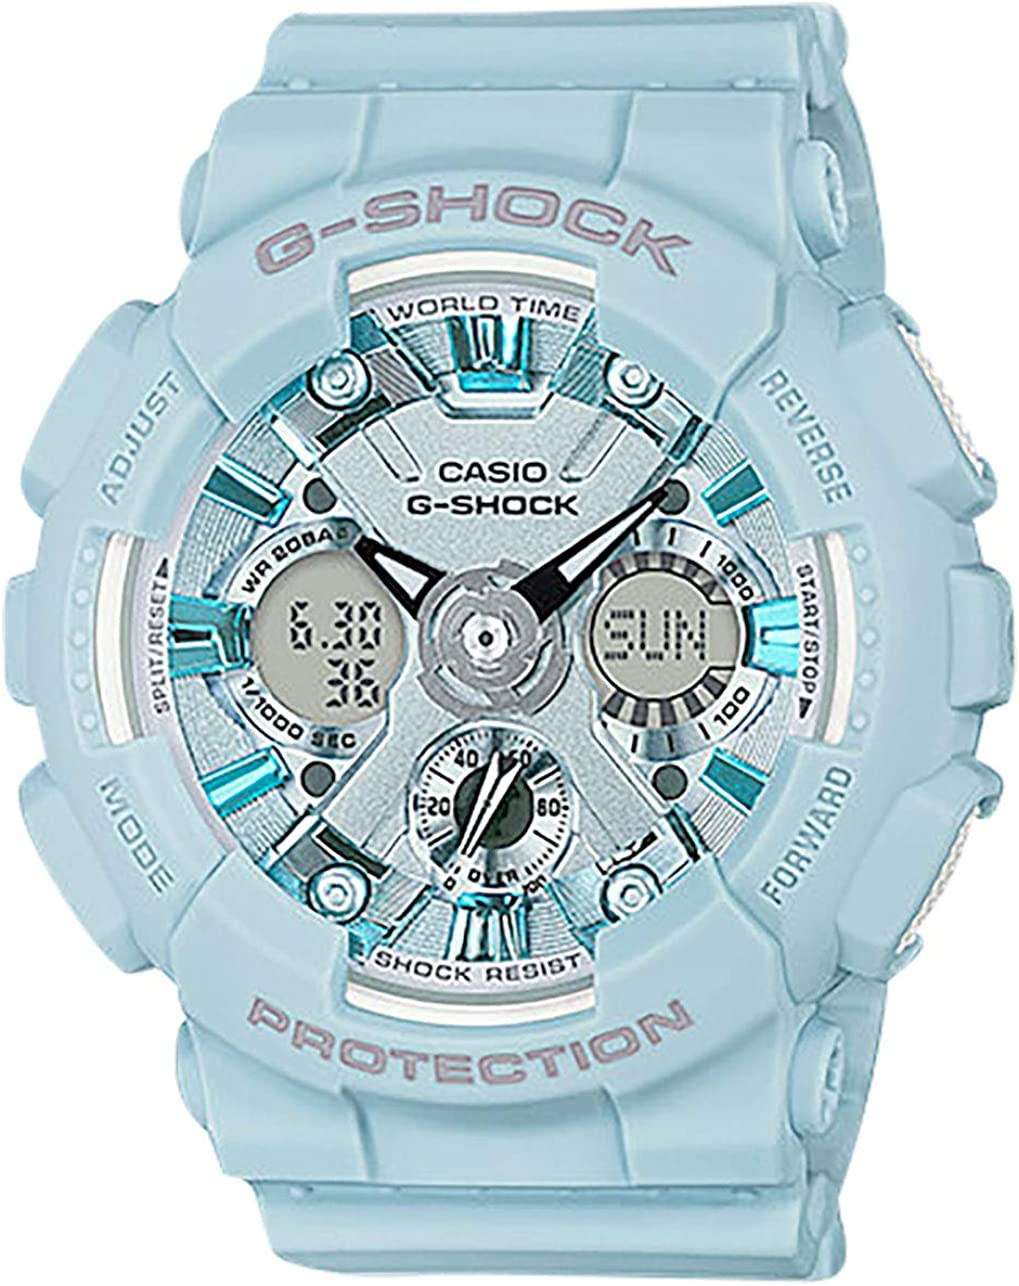 Casio G-Shock Ladies Watch GMAS120DP-2A